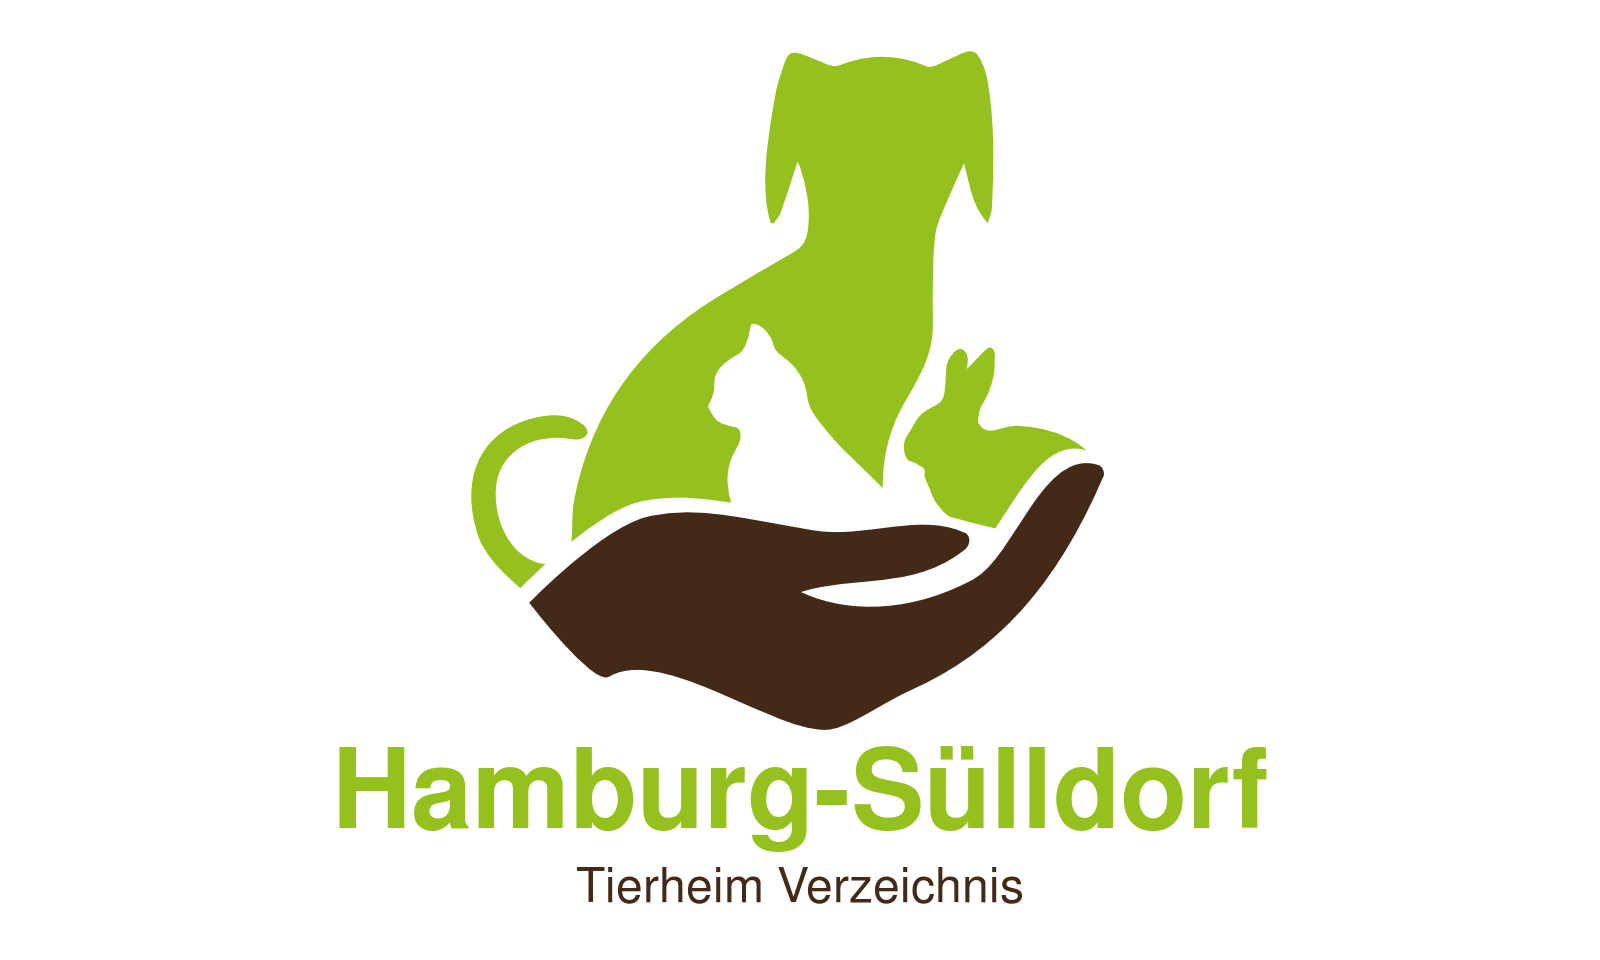 Tierheim Hamburg Sülldorf